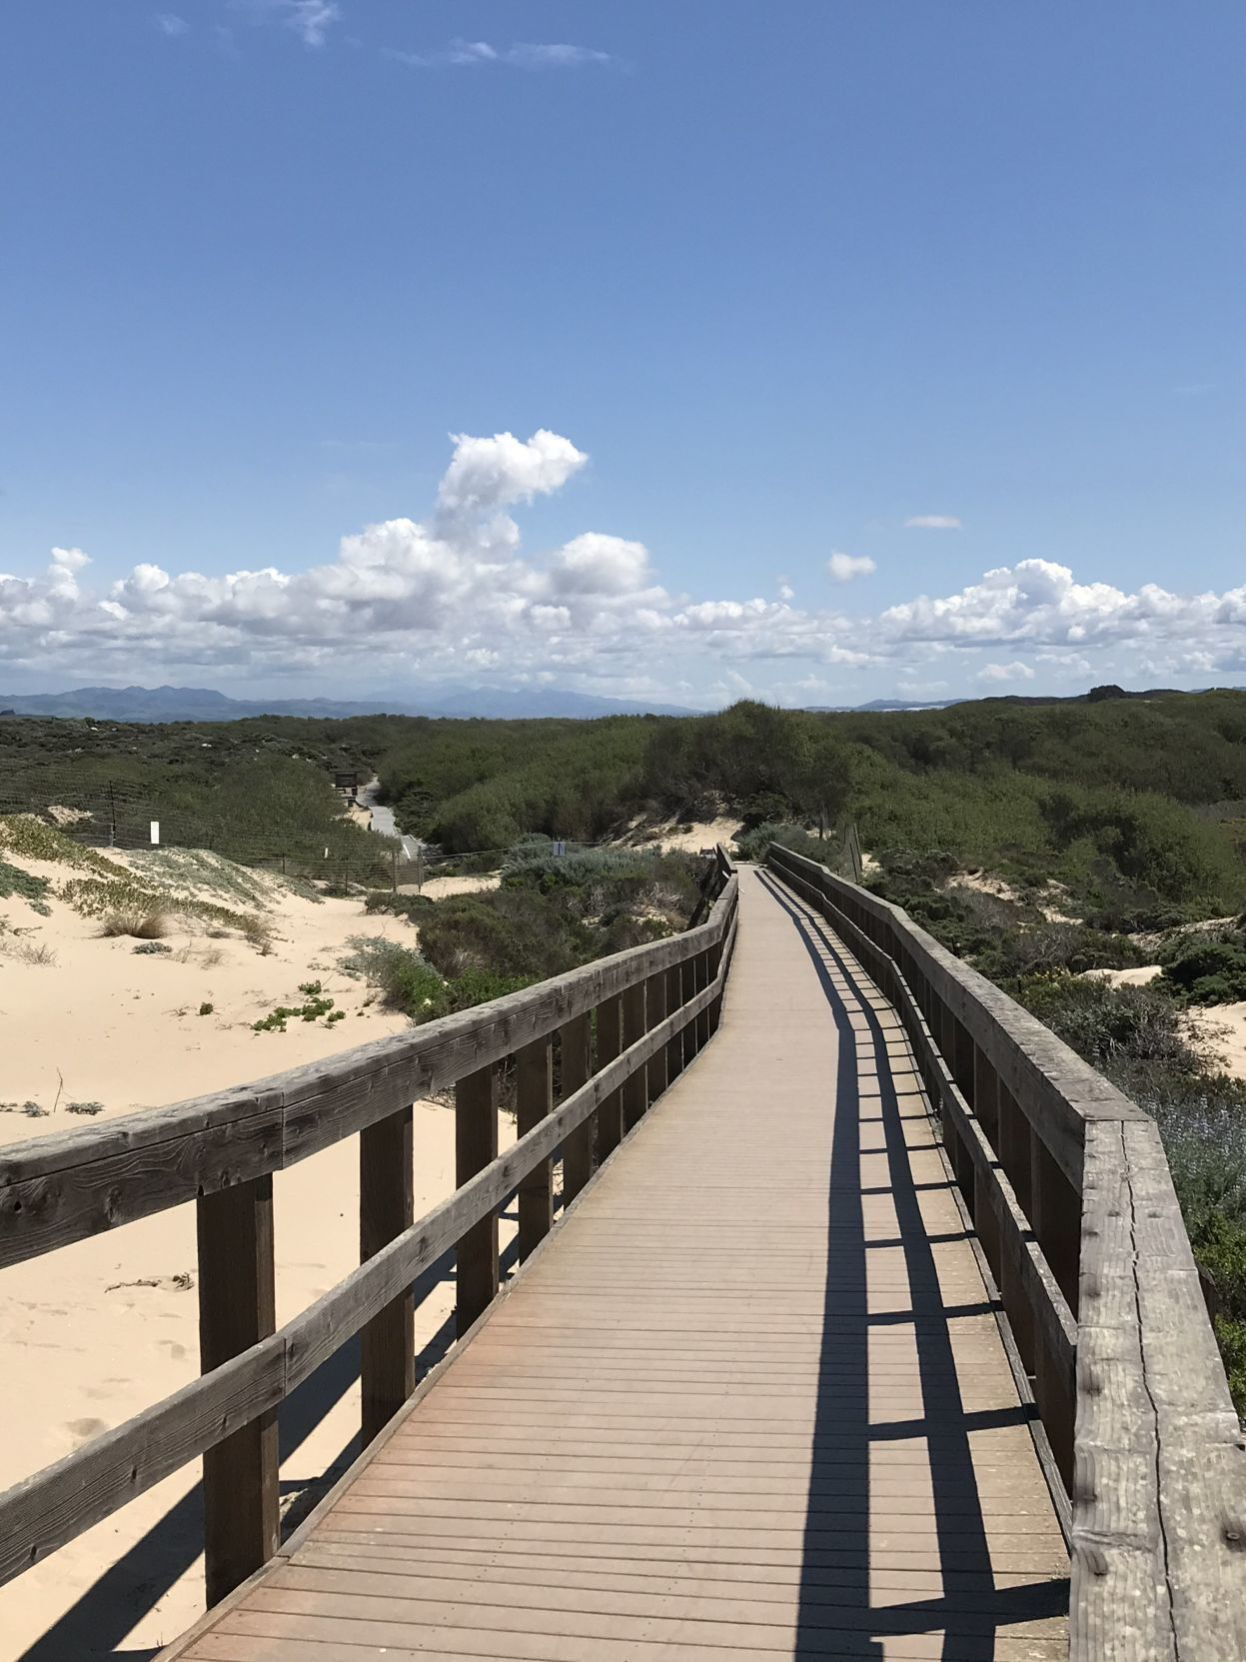 Central Coast recreational spots still open for roaming